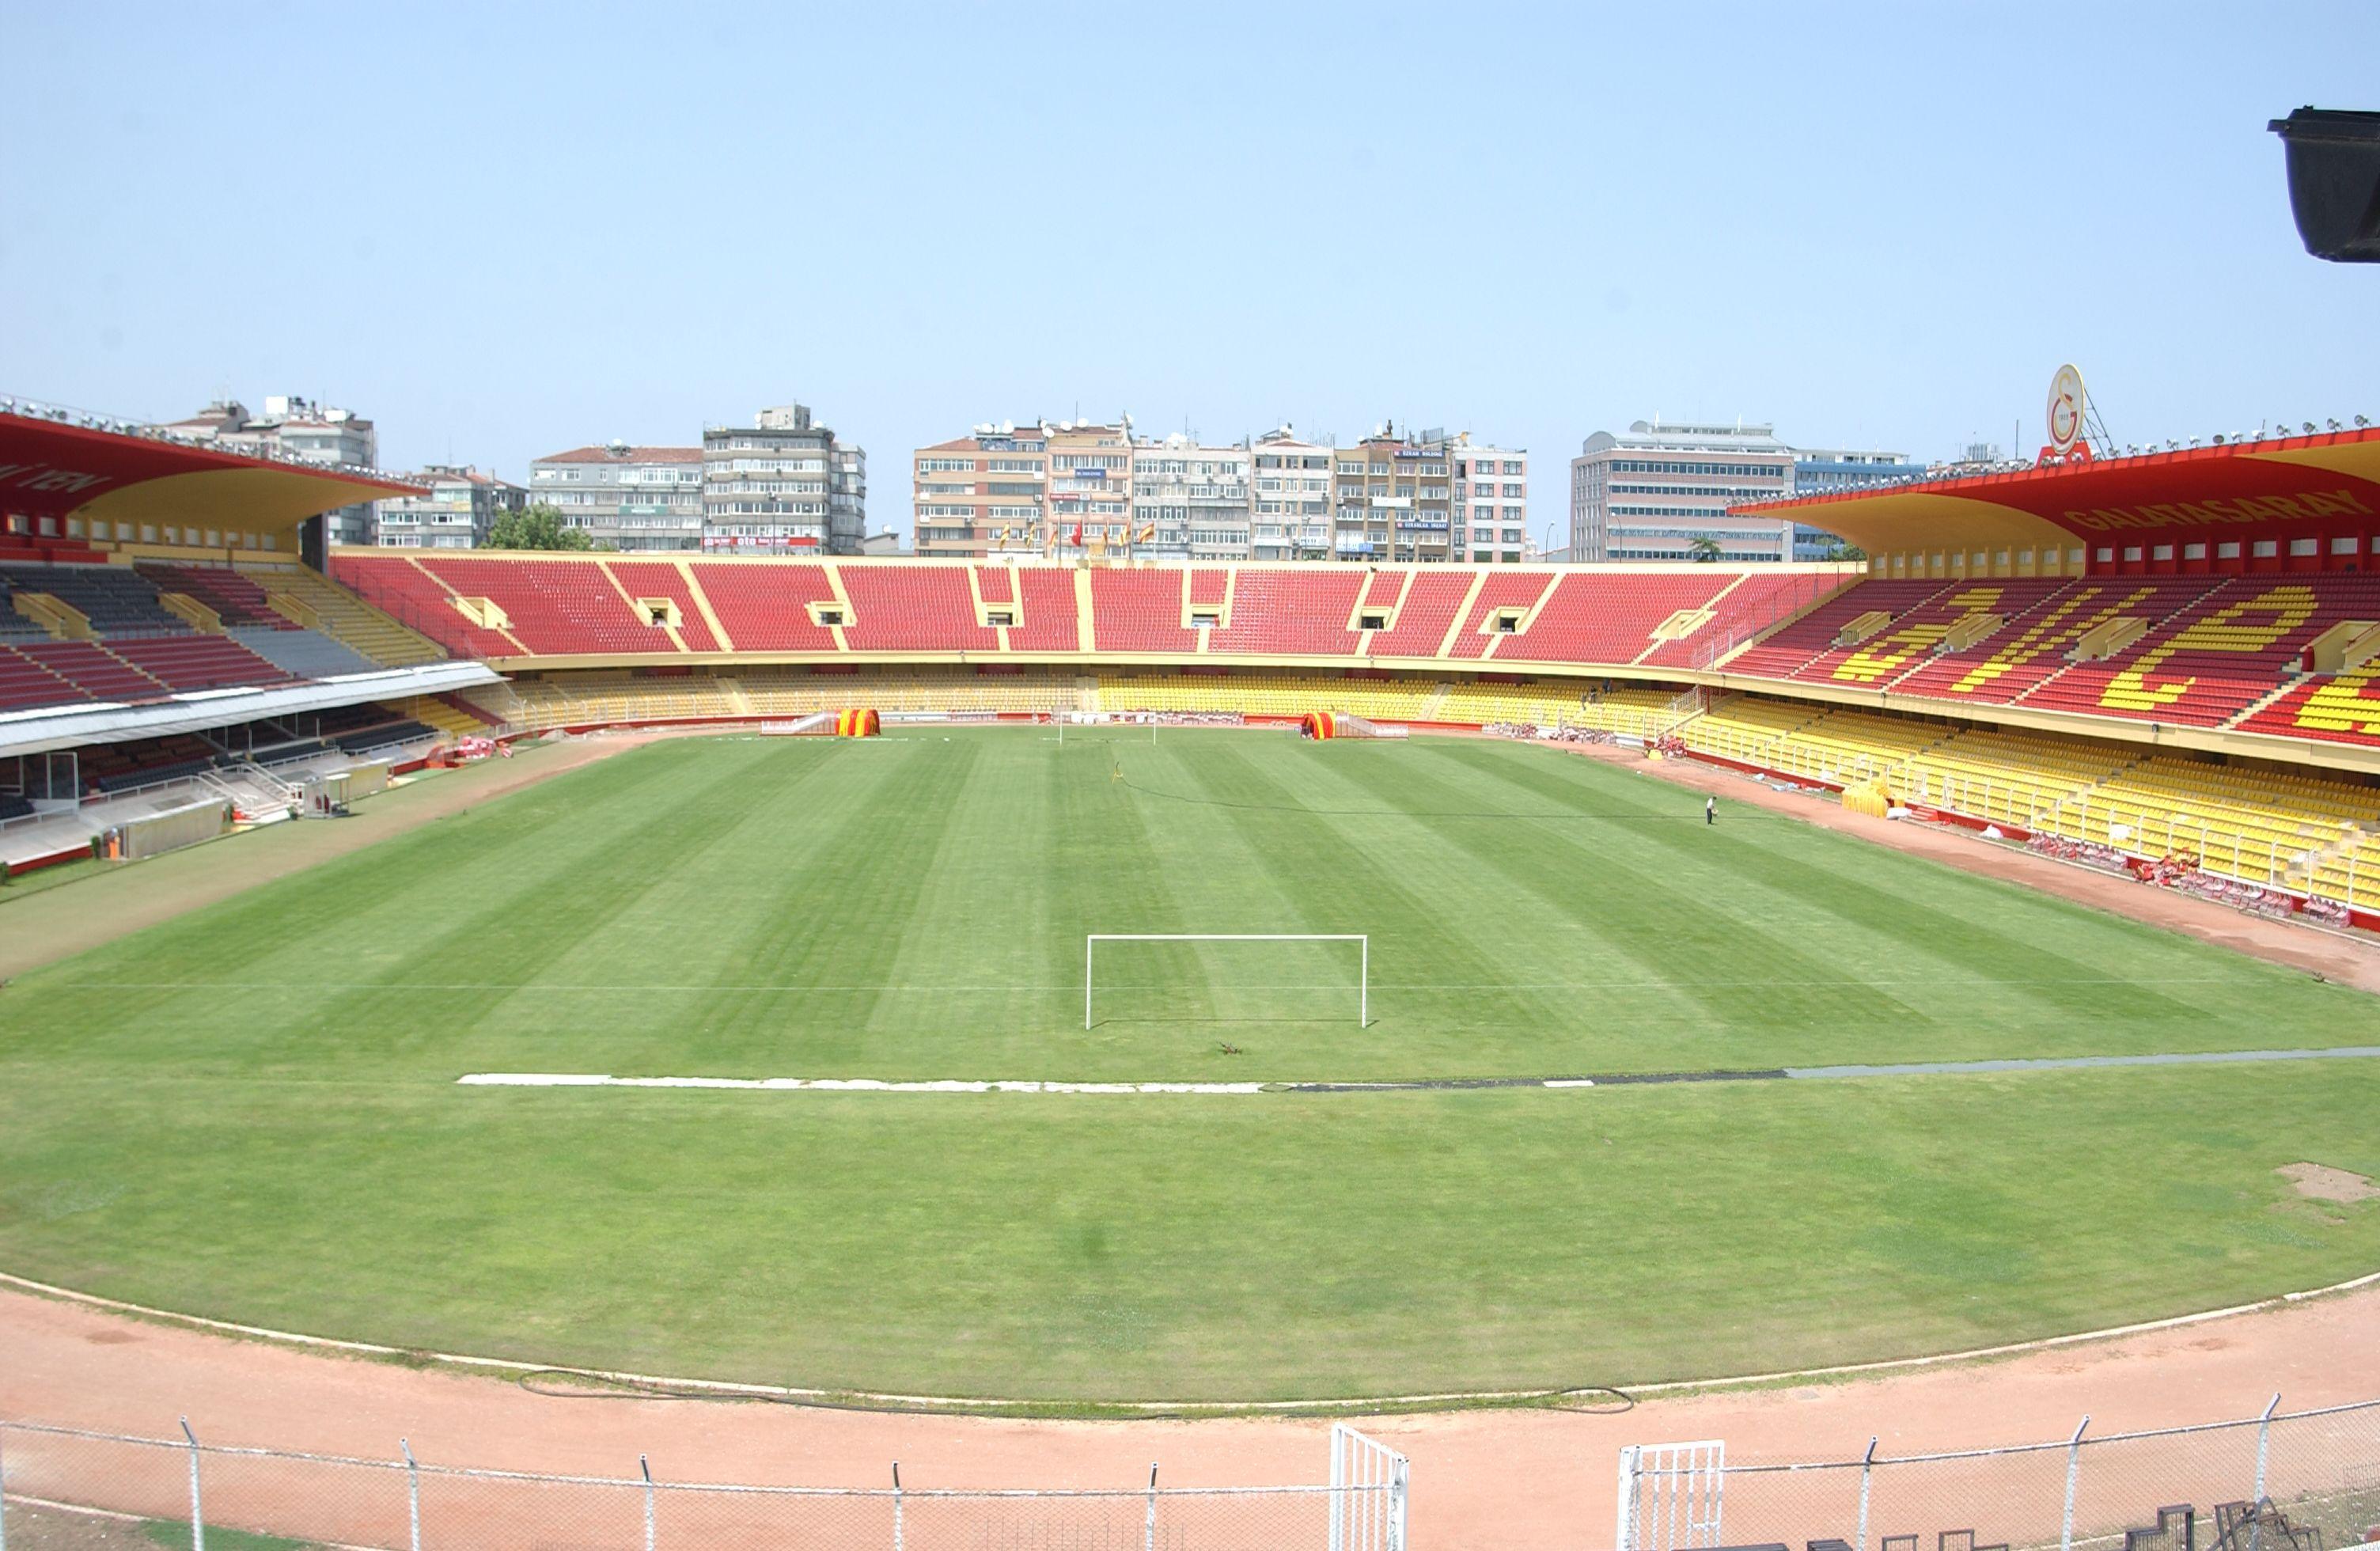 stadi hillside high school - HD3008×1960